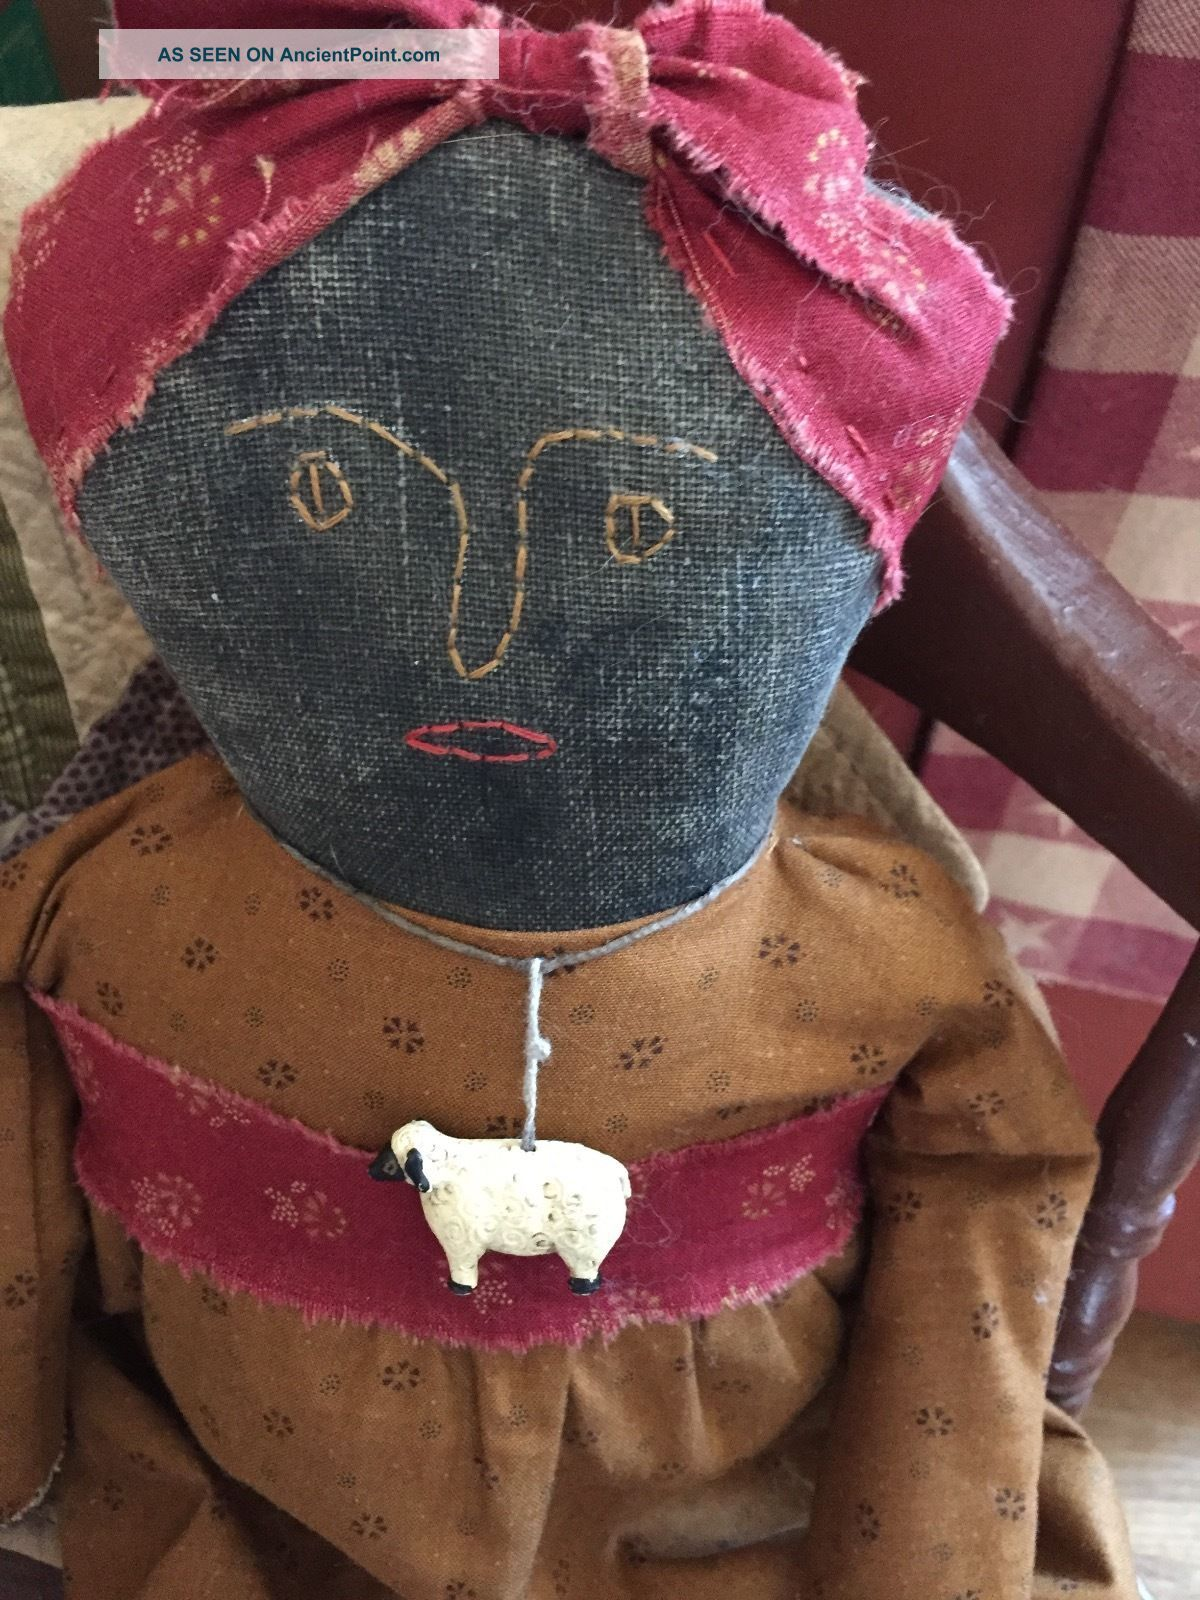 Early Primitive Handmade Black Doll Mustard/red Repro Civil War Fabric Primitives photo